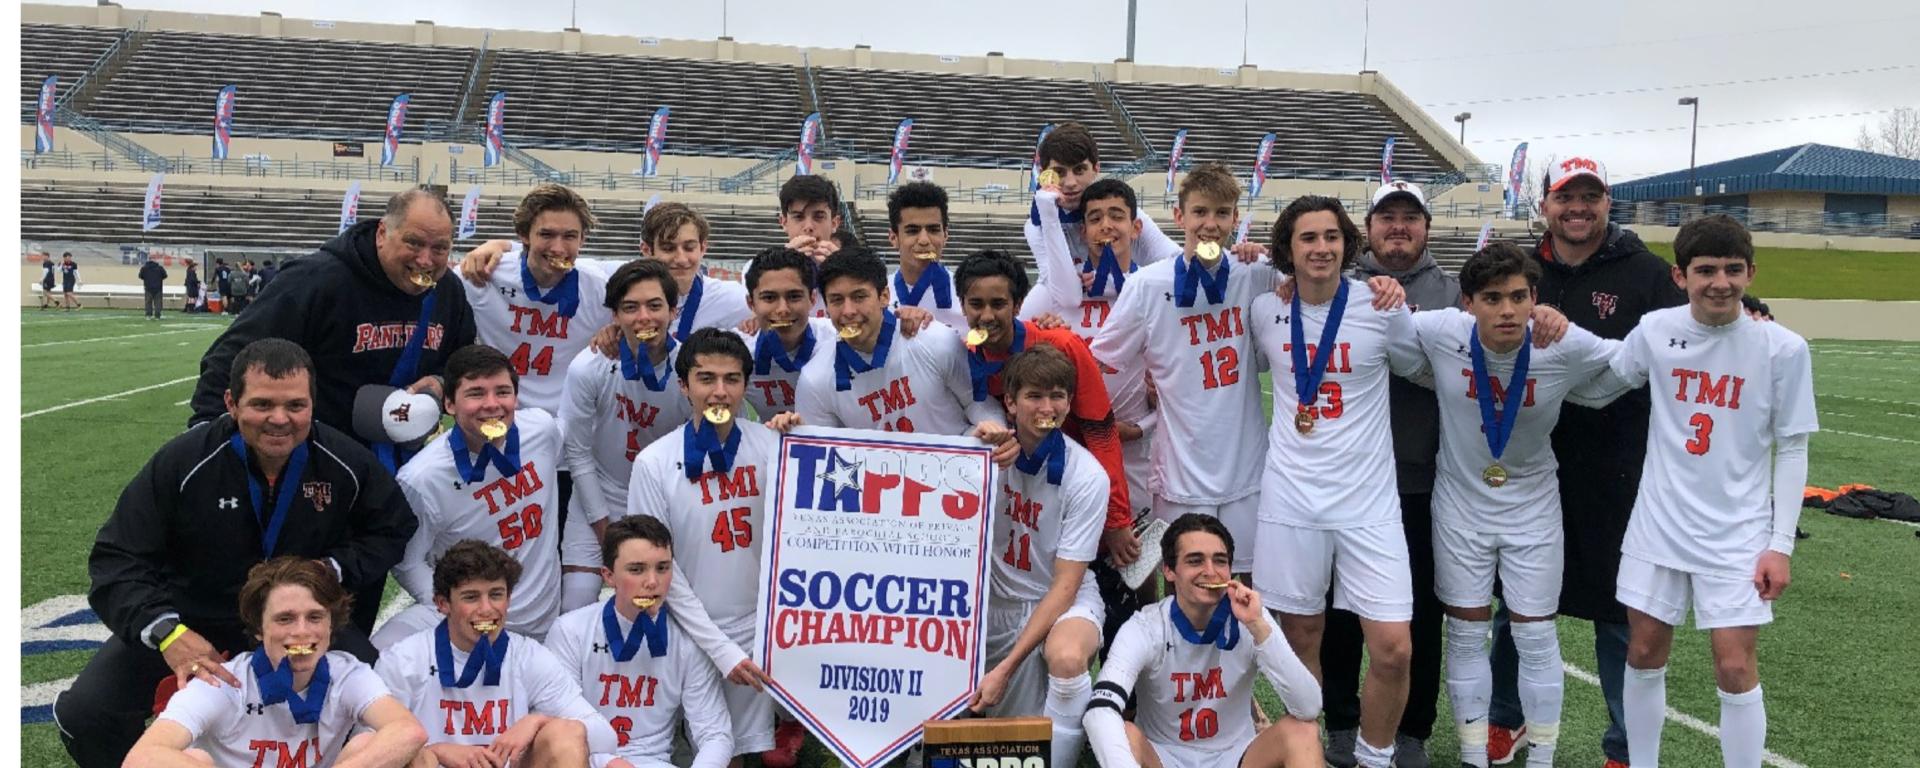 Photo of The TMI boys varsity soccer team celebrating their state championship on Feb. 22 in Waco.